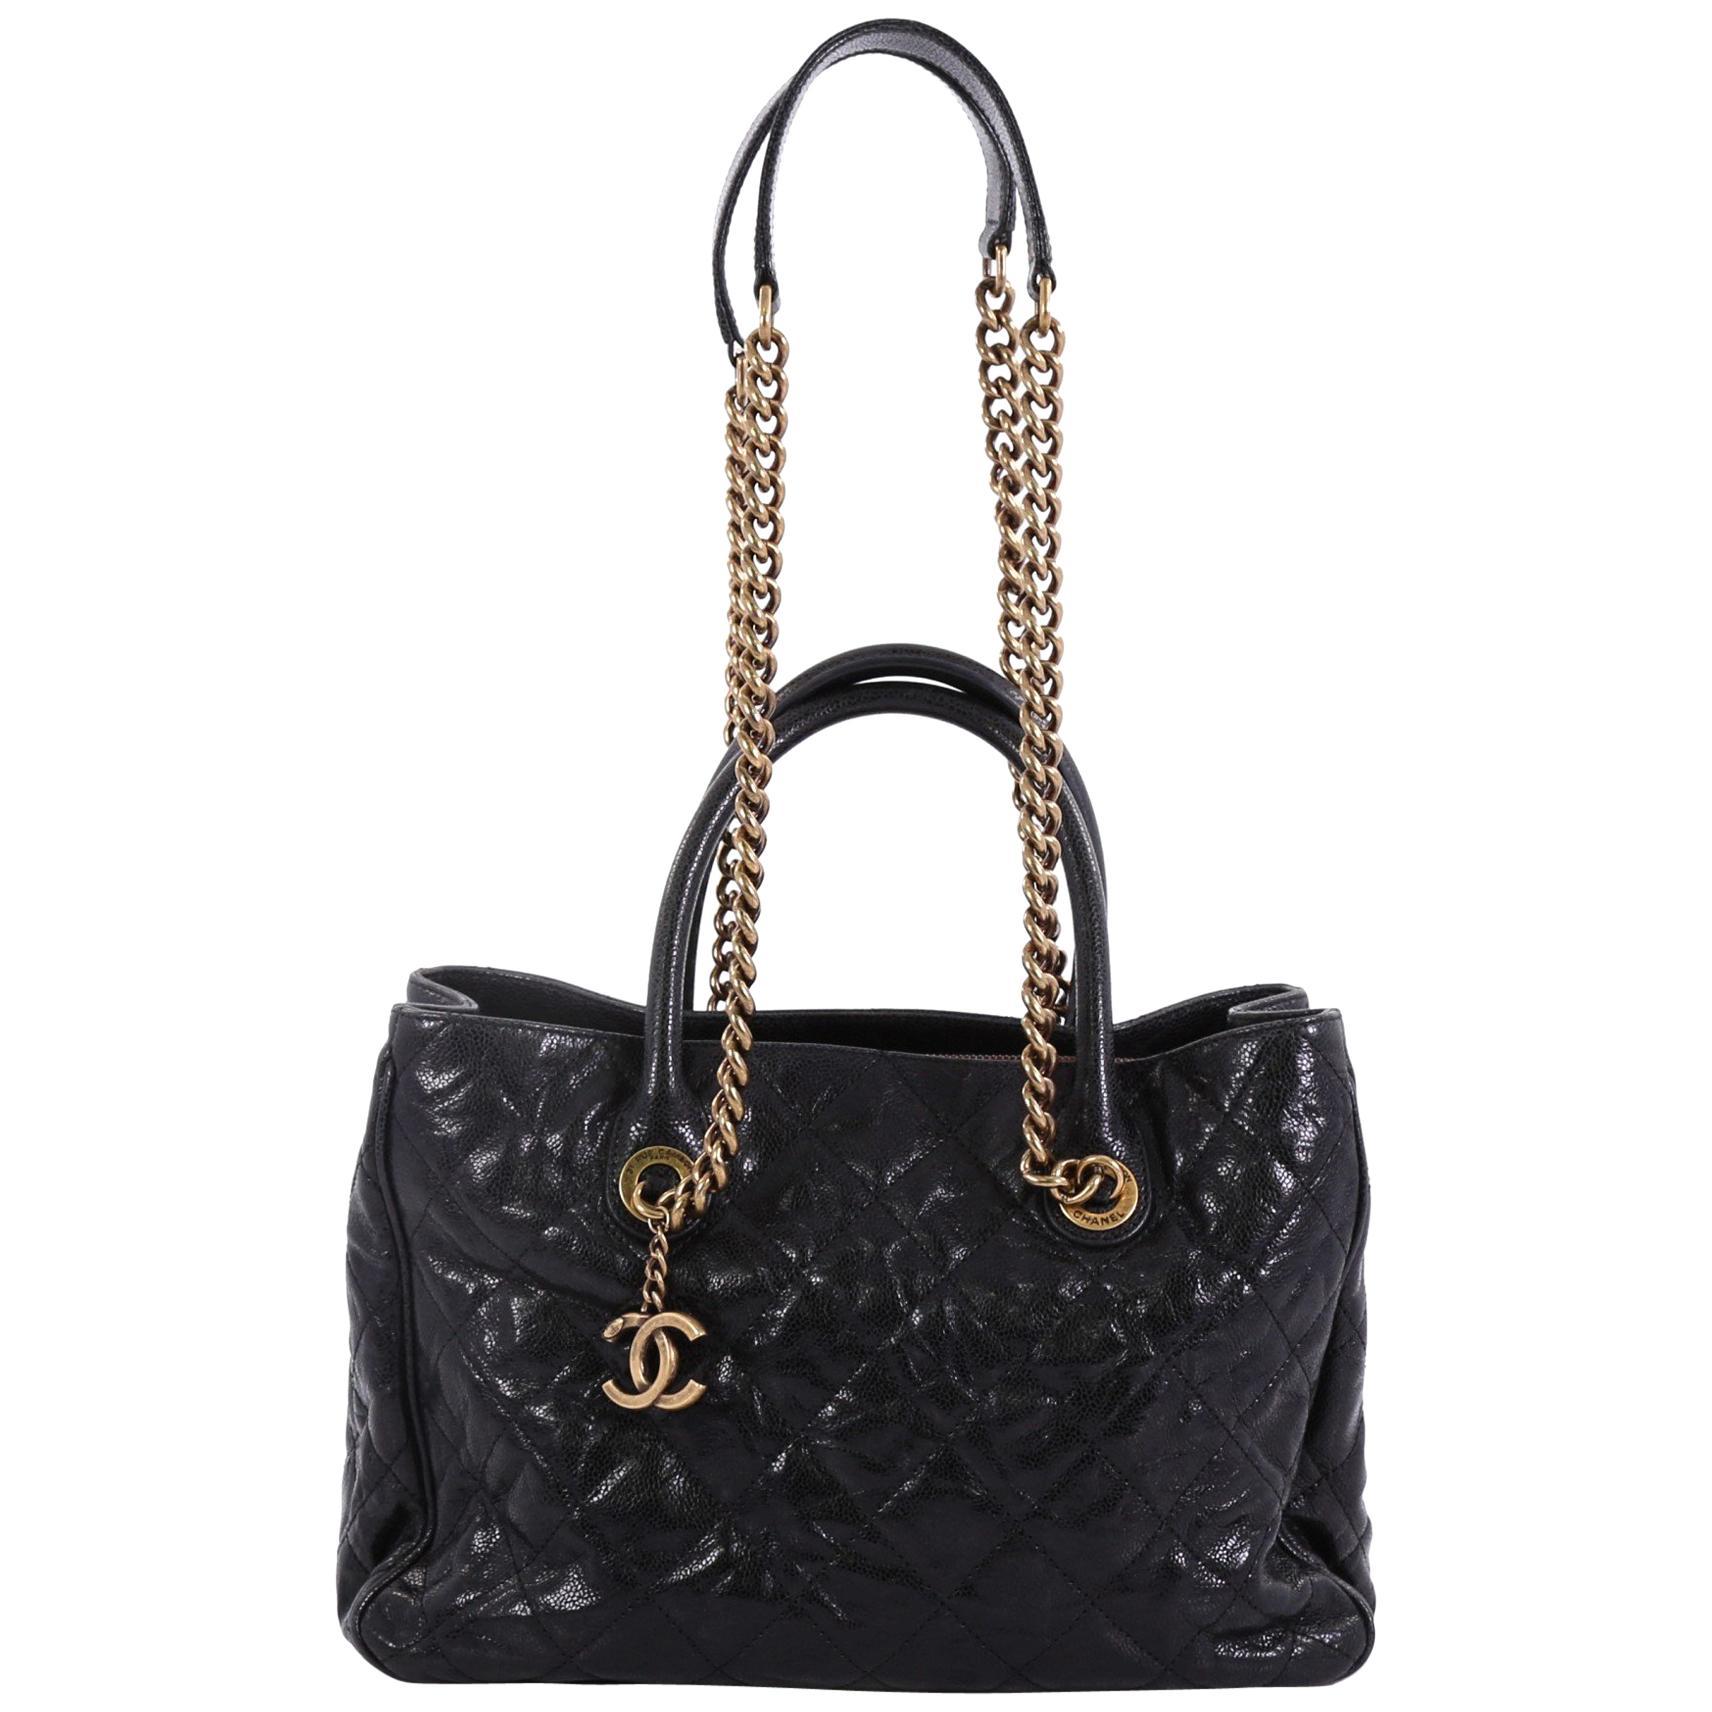 c9c1dd4b9650 Rebag Handbags and Purses - 1stdibs - Page 7